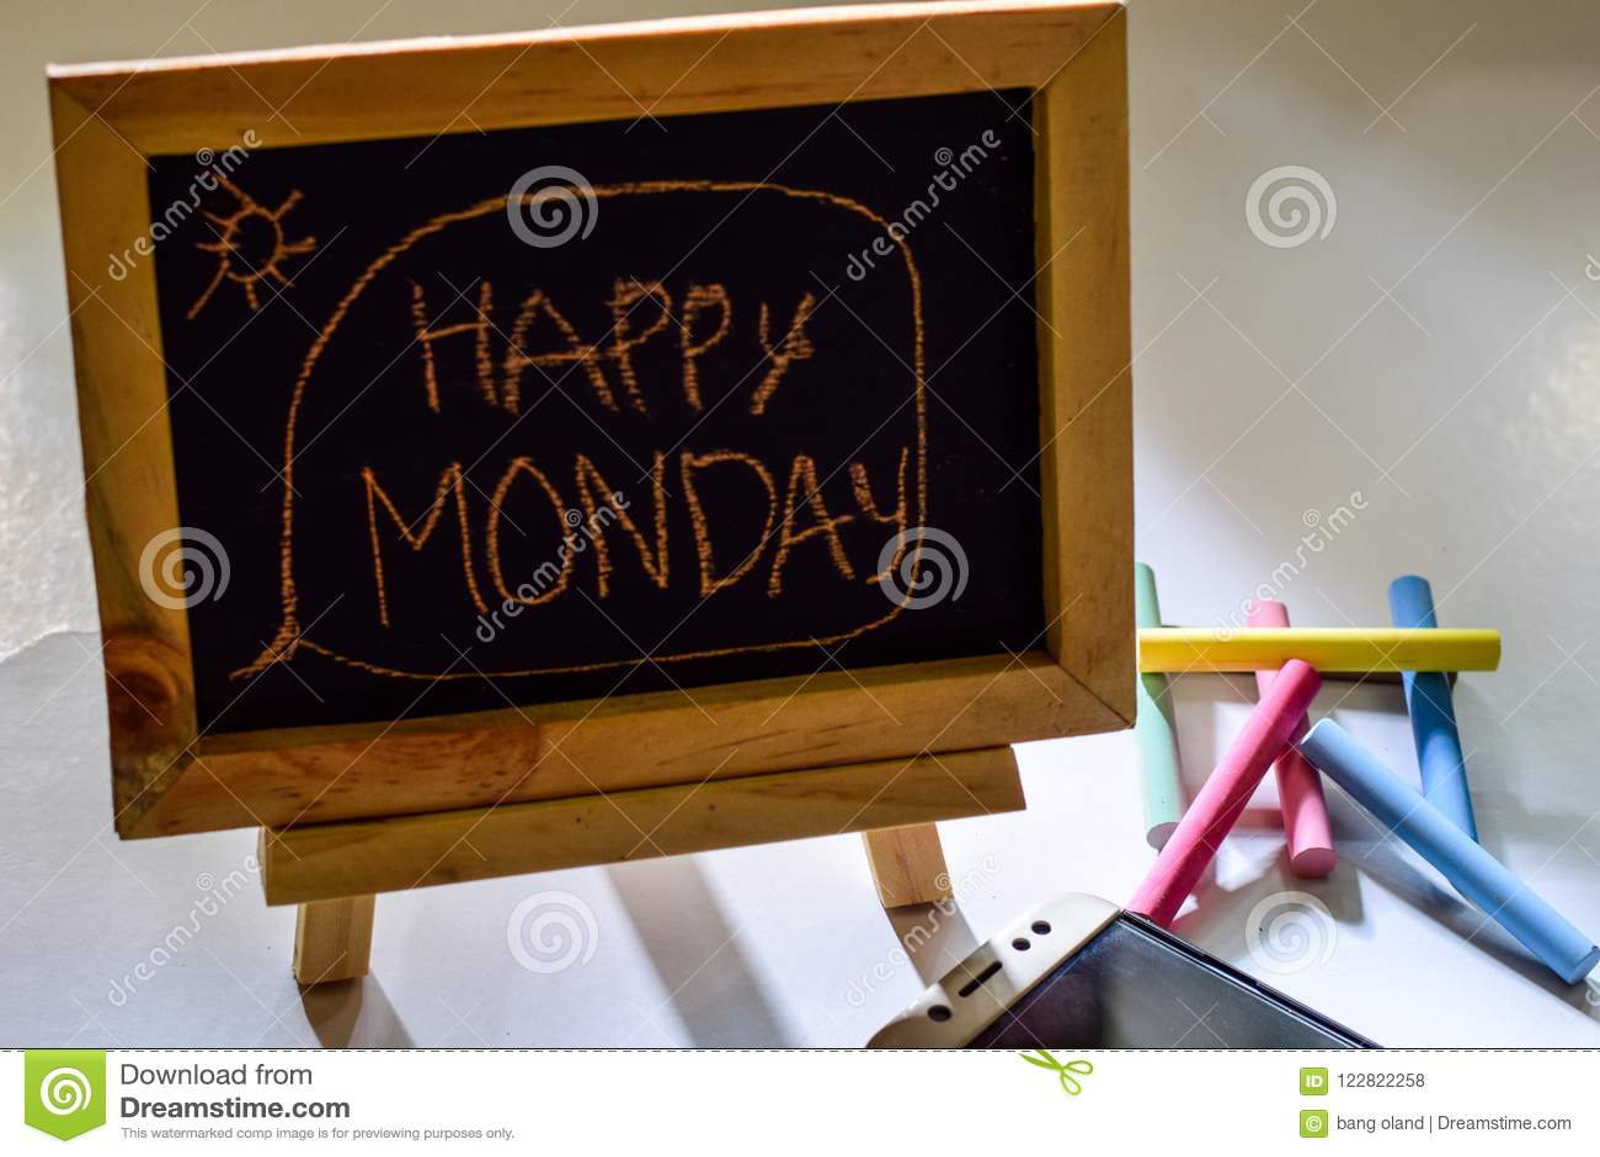 Esprima lunedì felice scritto su una lavagna e sullo smartphone, gesso variopinto